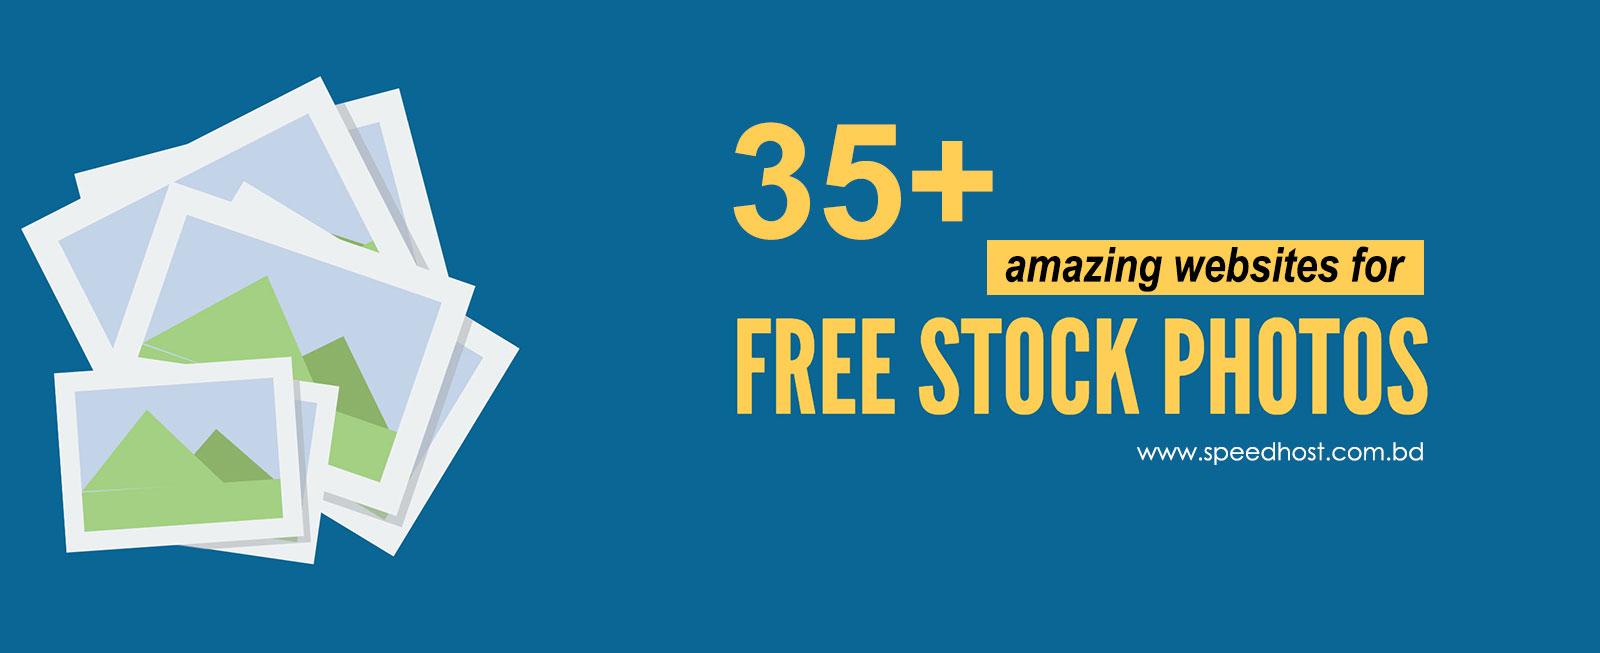 35+ Best Free Stock Photo Websites In 2021 (Updated)